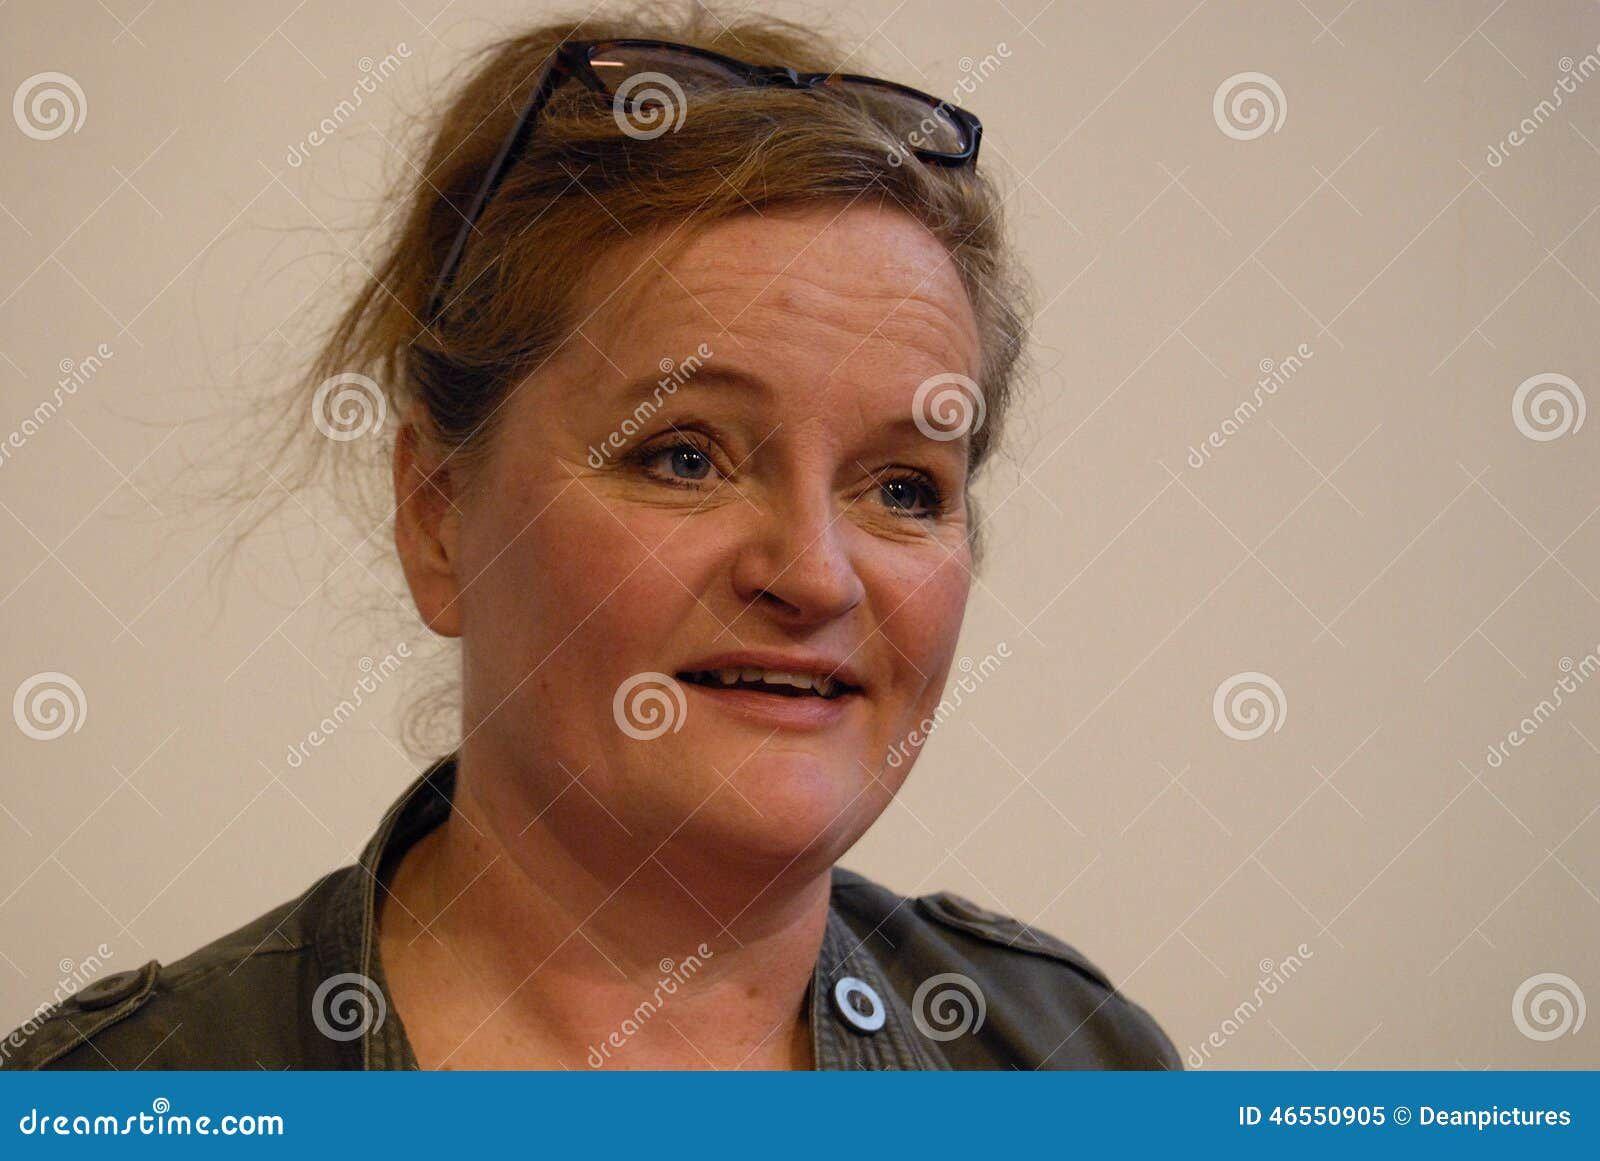 Danish Dorthe